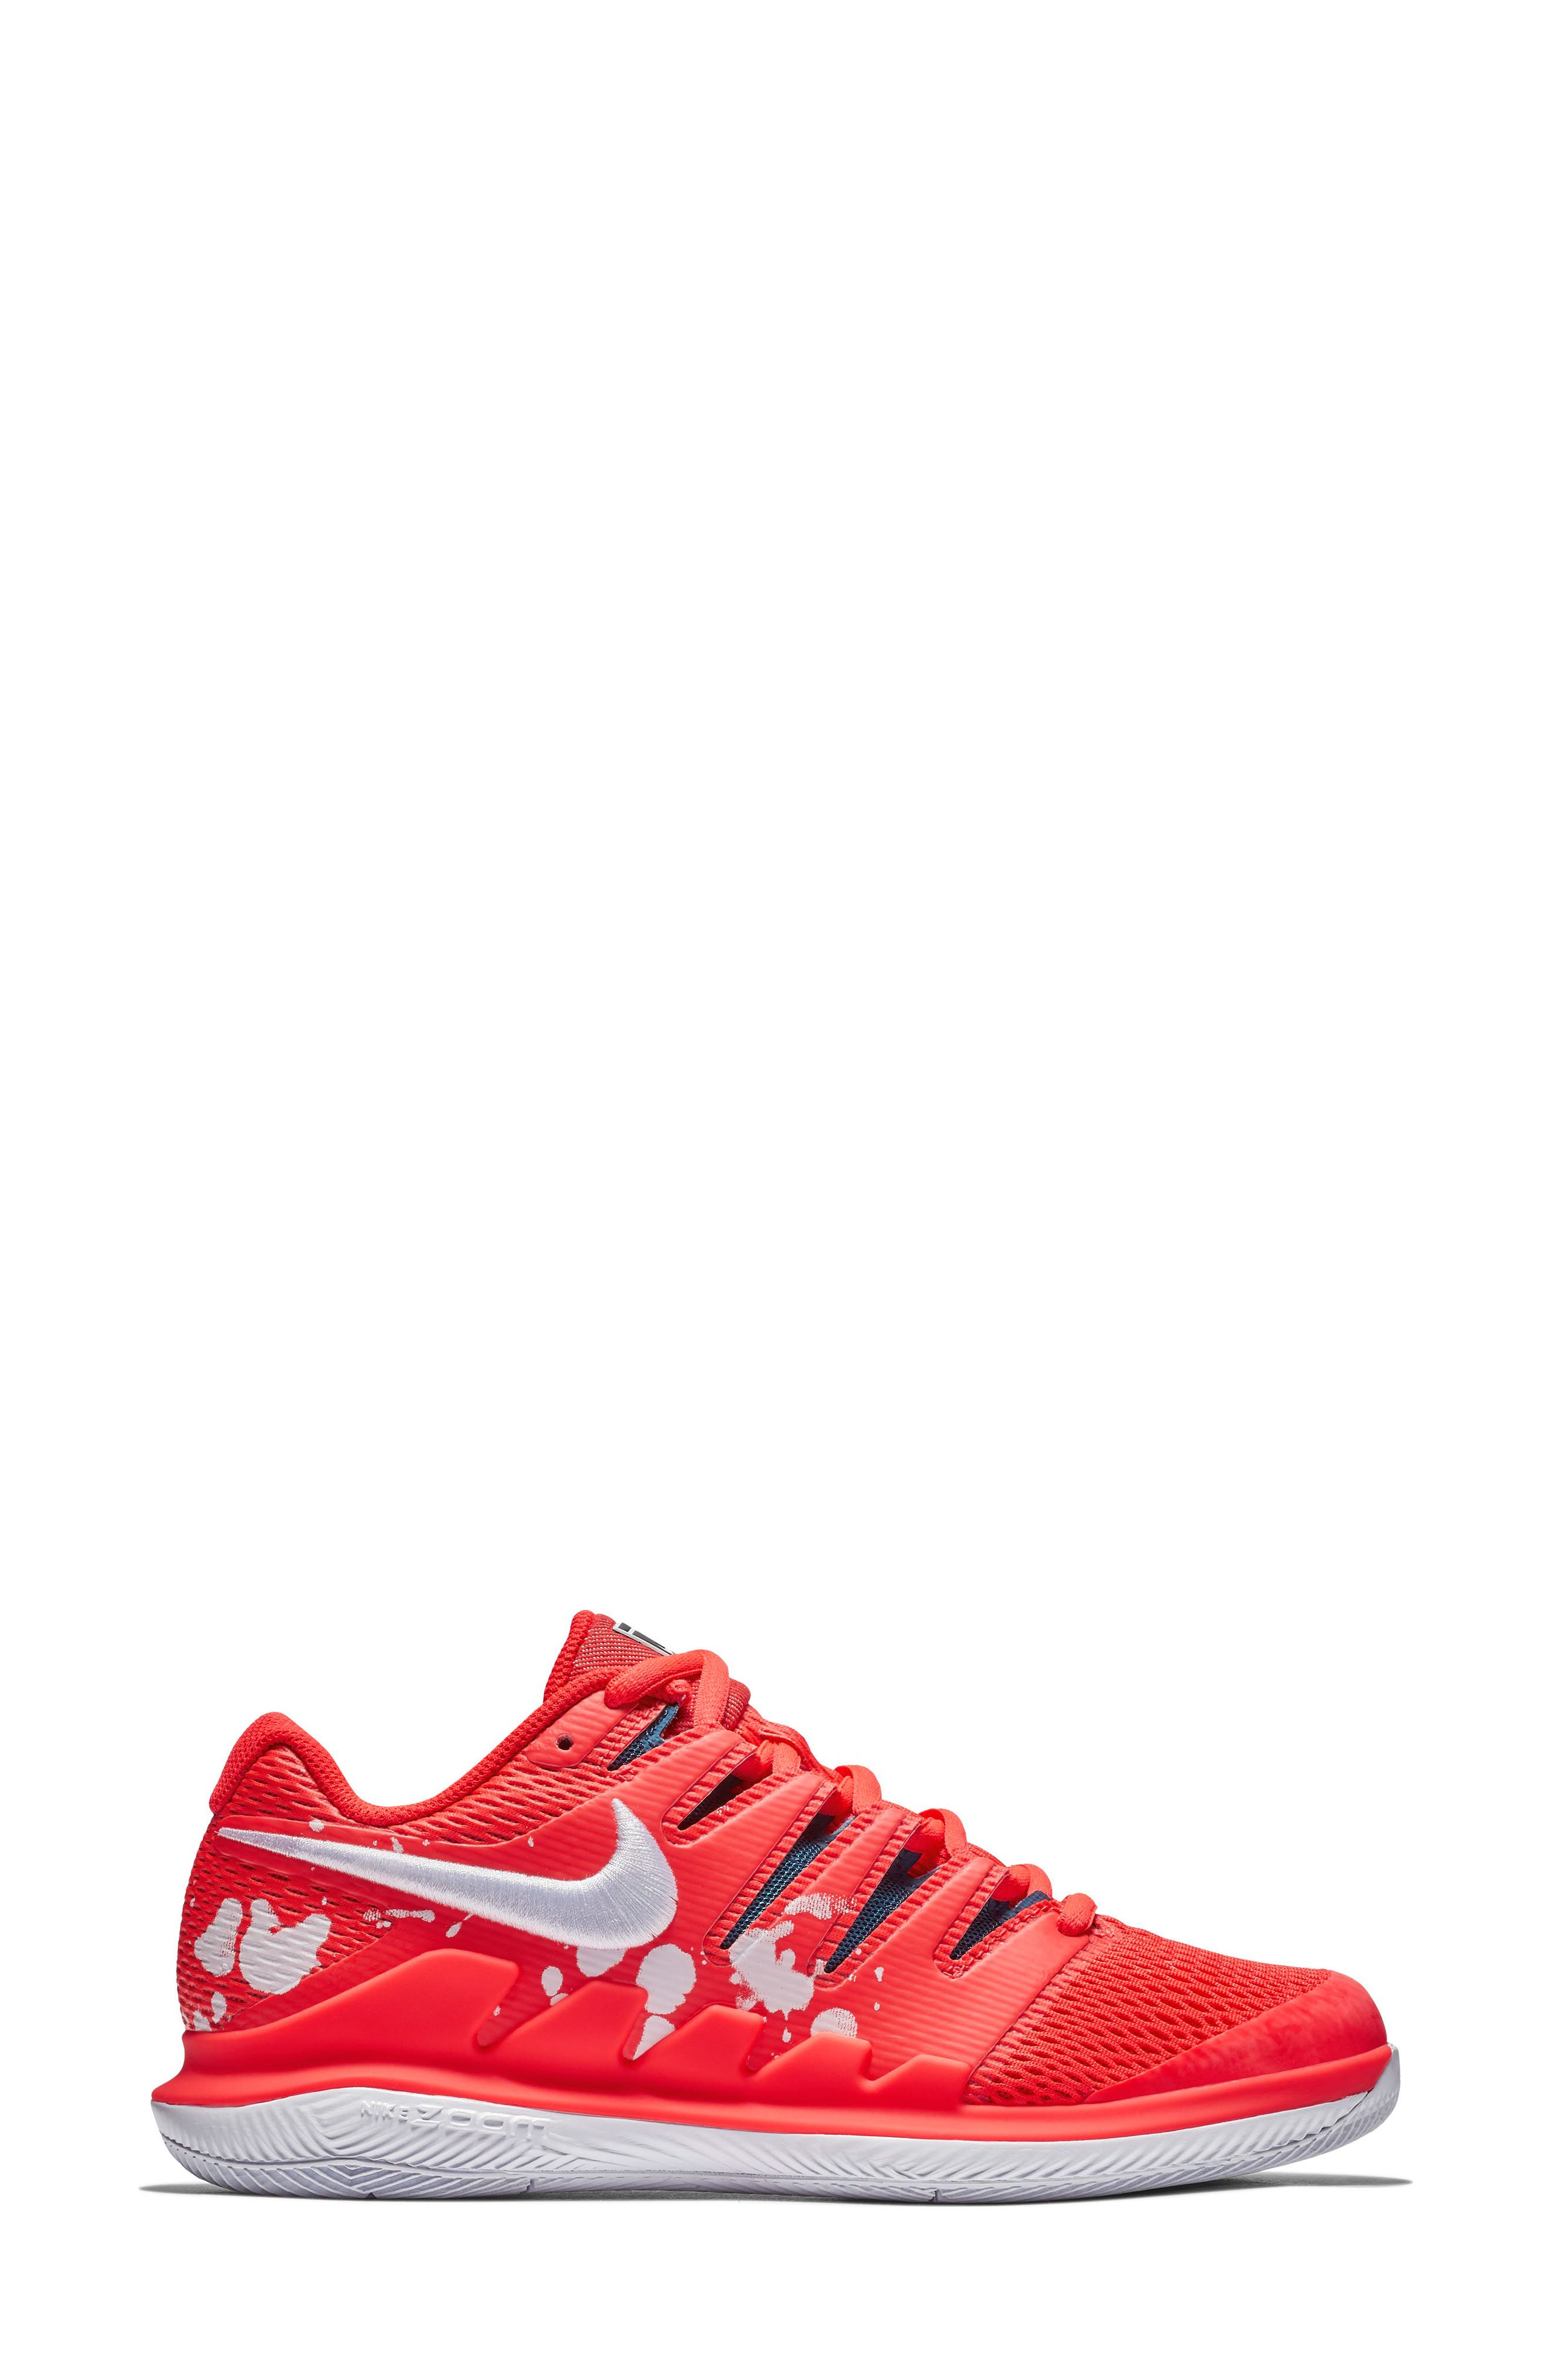 Air Zoom Vapor X Tennis Shoe,                             Alternate thumbnail 3, color,                             BRIGHT CRIMSON/ WHITE- BLUE